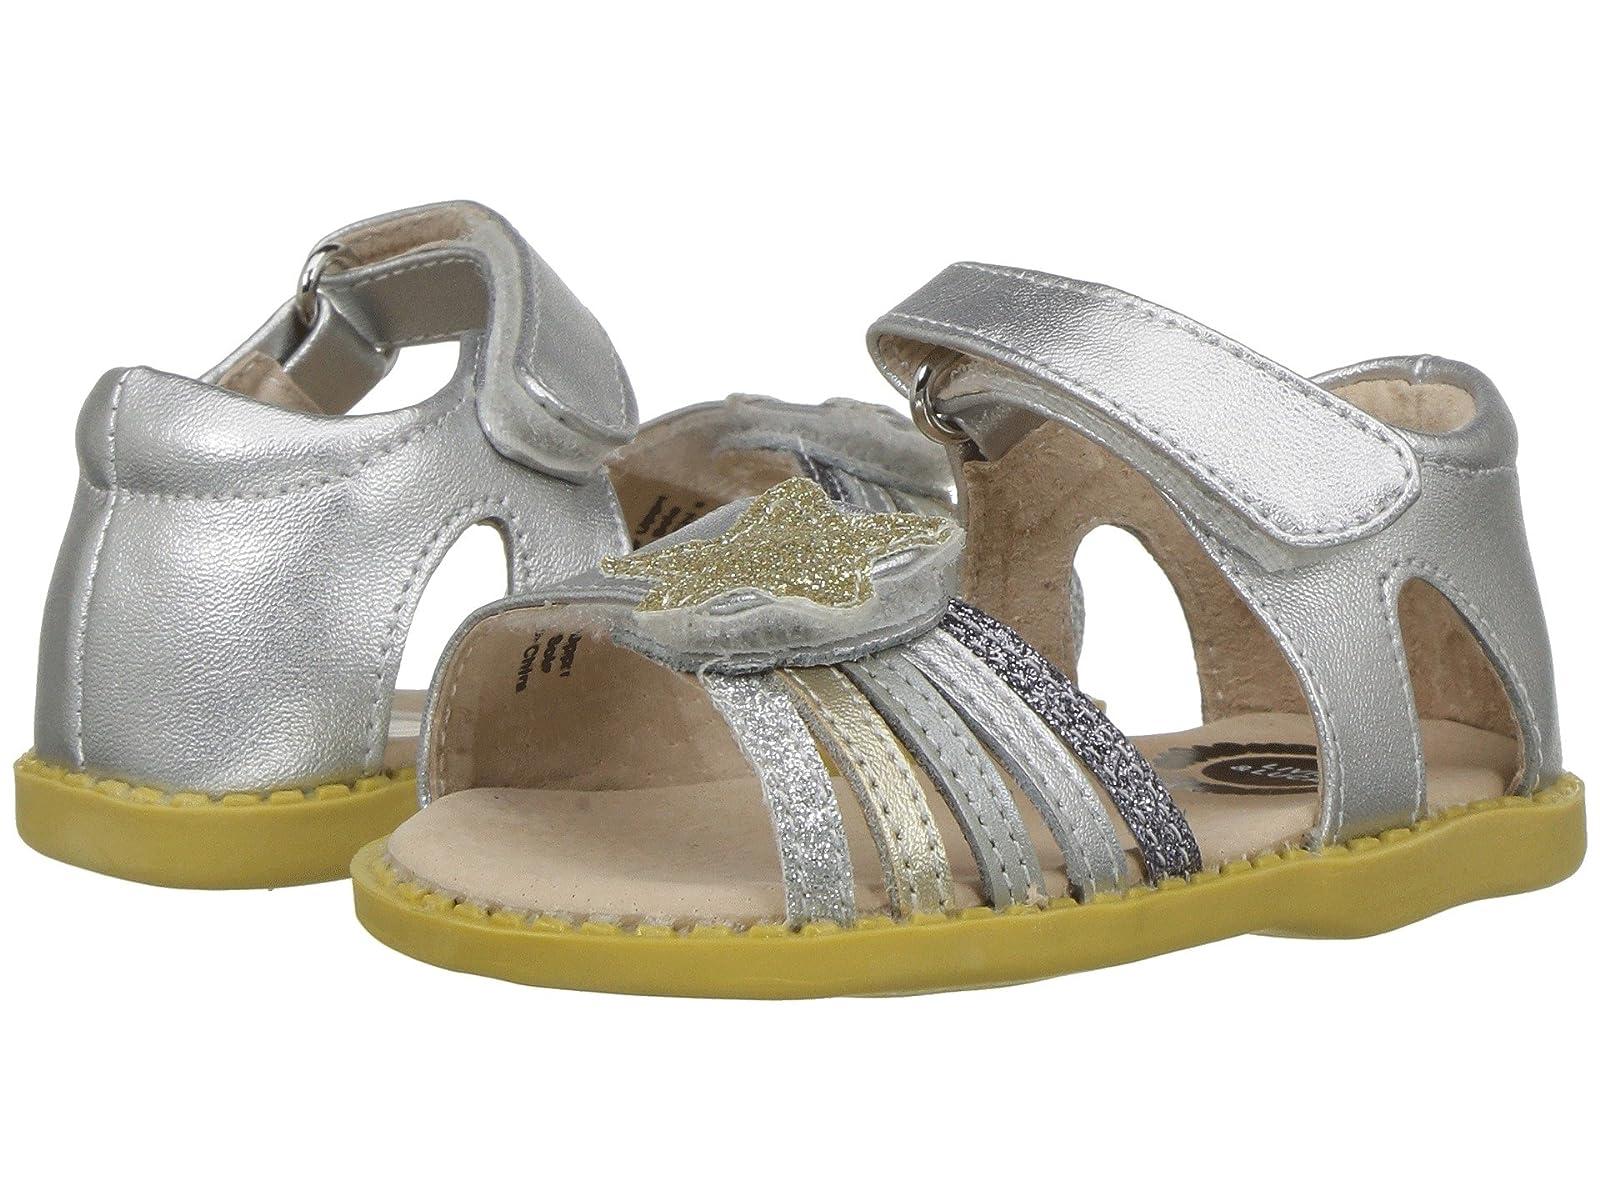 Livie & Luca Nova (Toddler/Little Kid)Cheap and distinctive eye-catching shoes